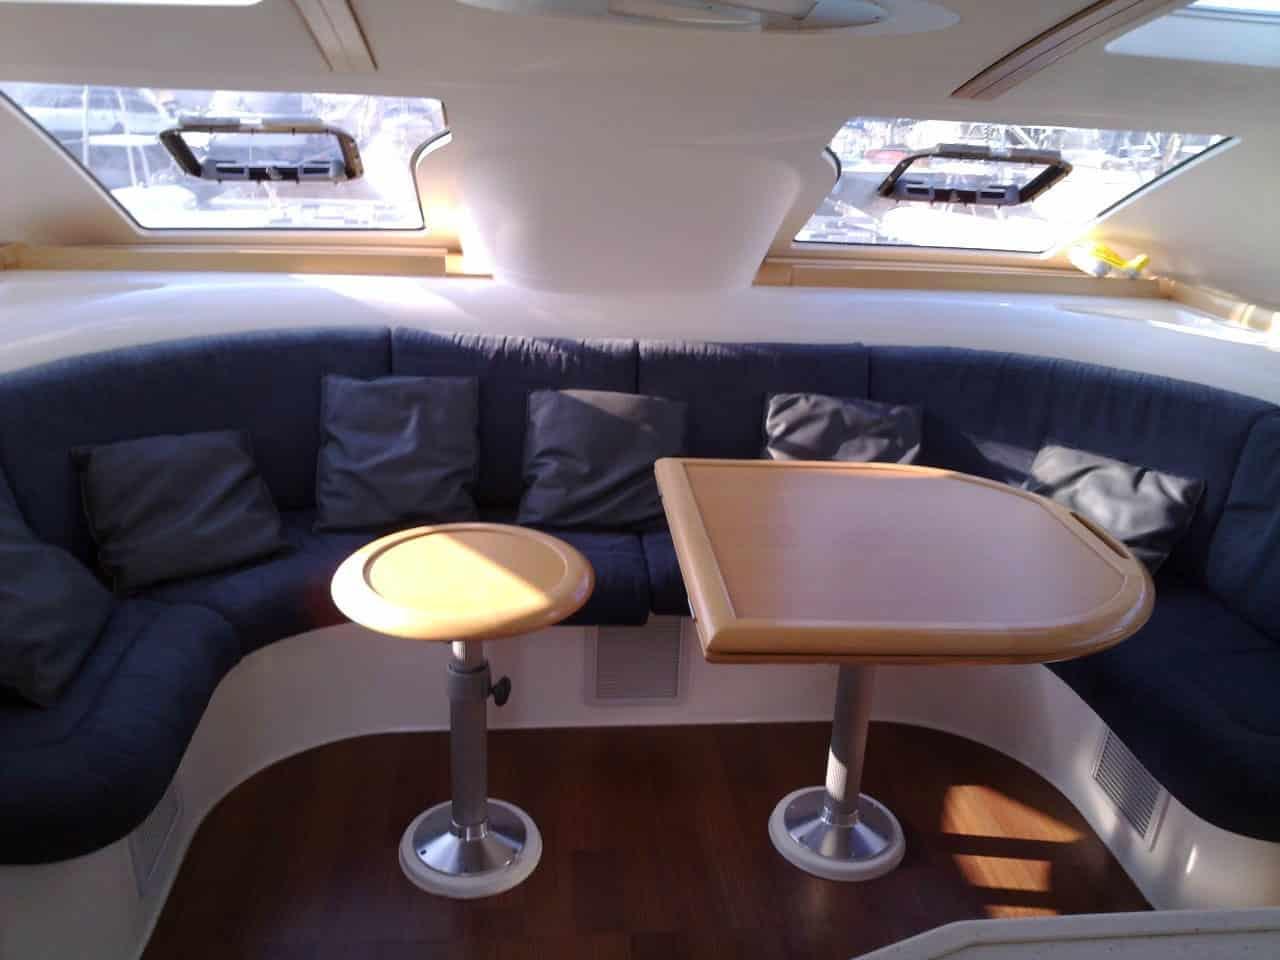 naututech-47-yacht-charter-croatia-sailing-holidays-croatia-booking-yacht-charter-croatia-catamarans-sailboats-motorboats-gulets-luxury-yachts-boat-rental-croatia